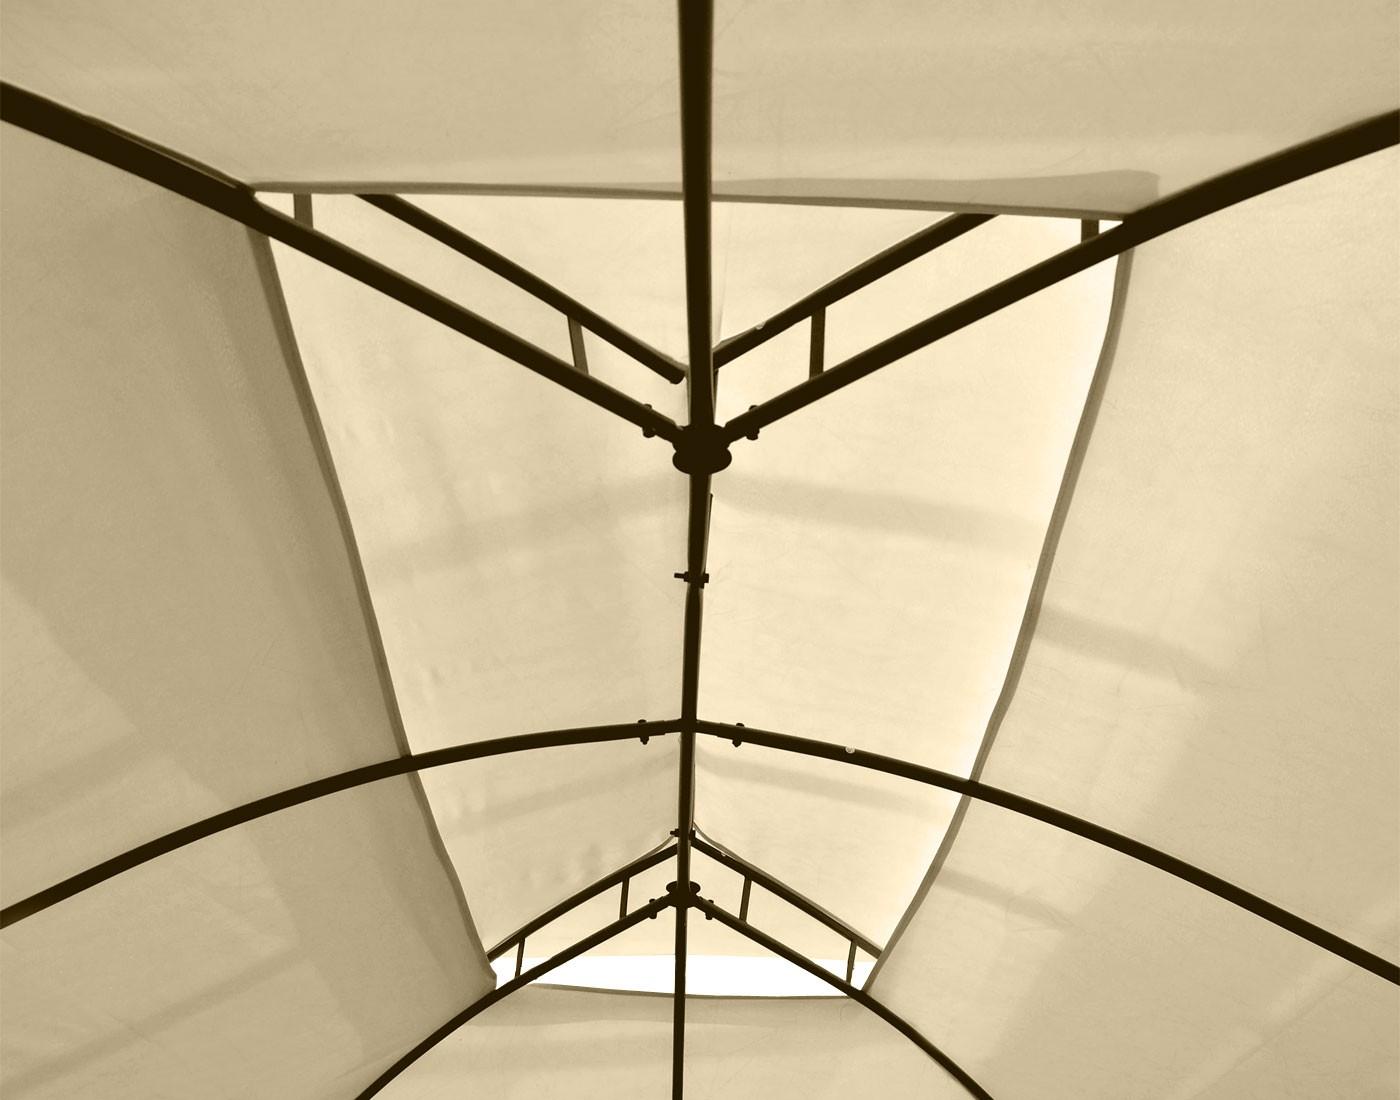 pergola garten pavillon 4cm stahl gestell mit seitenwand. Black Bedroom Furniture Sets. Home Design Ideas